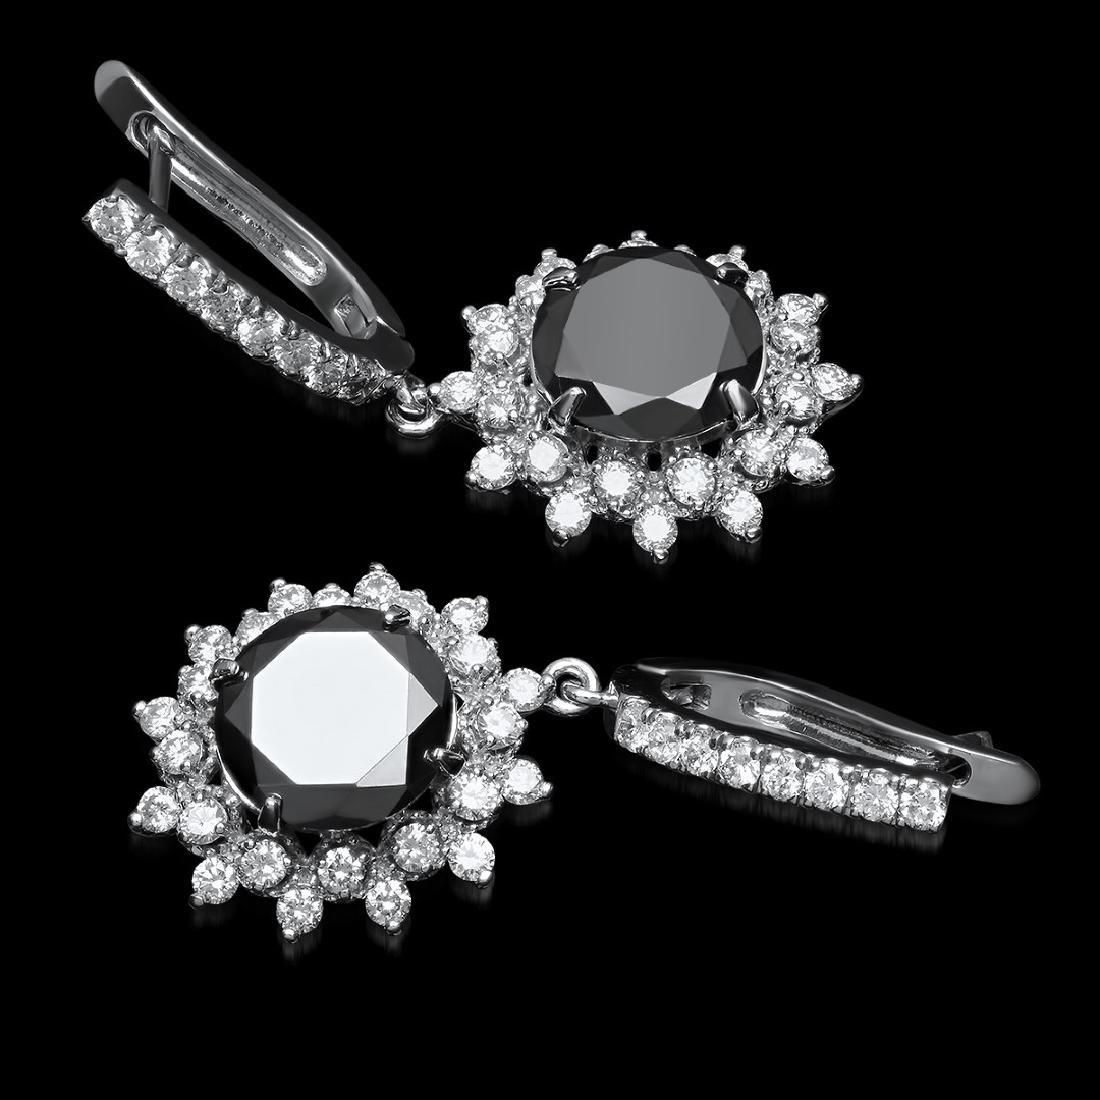 14K White Gold, 9.65cts Diamond Earrings - 2